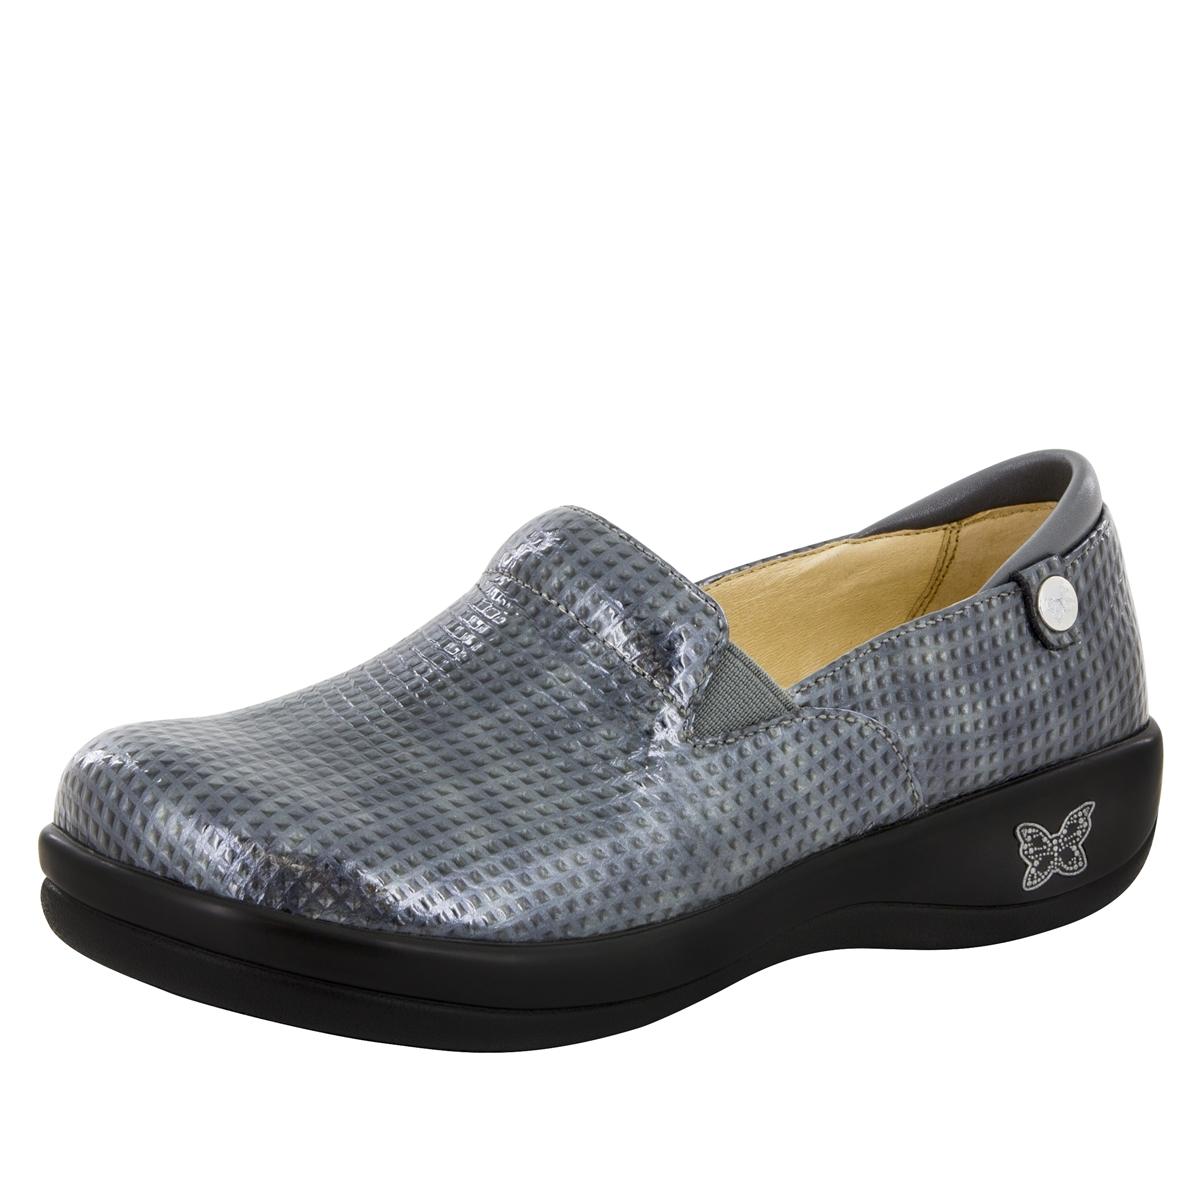 (8OTWUYNBRQ) Seville (Chrome Cube) Womens Clog Shoes Alegria Mules